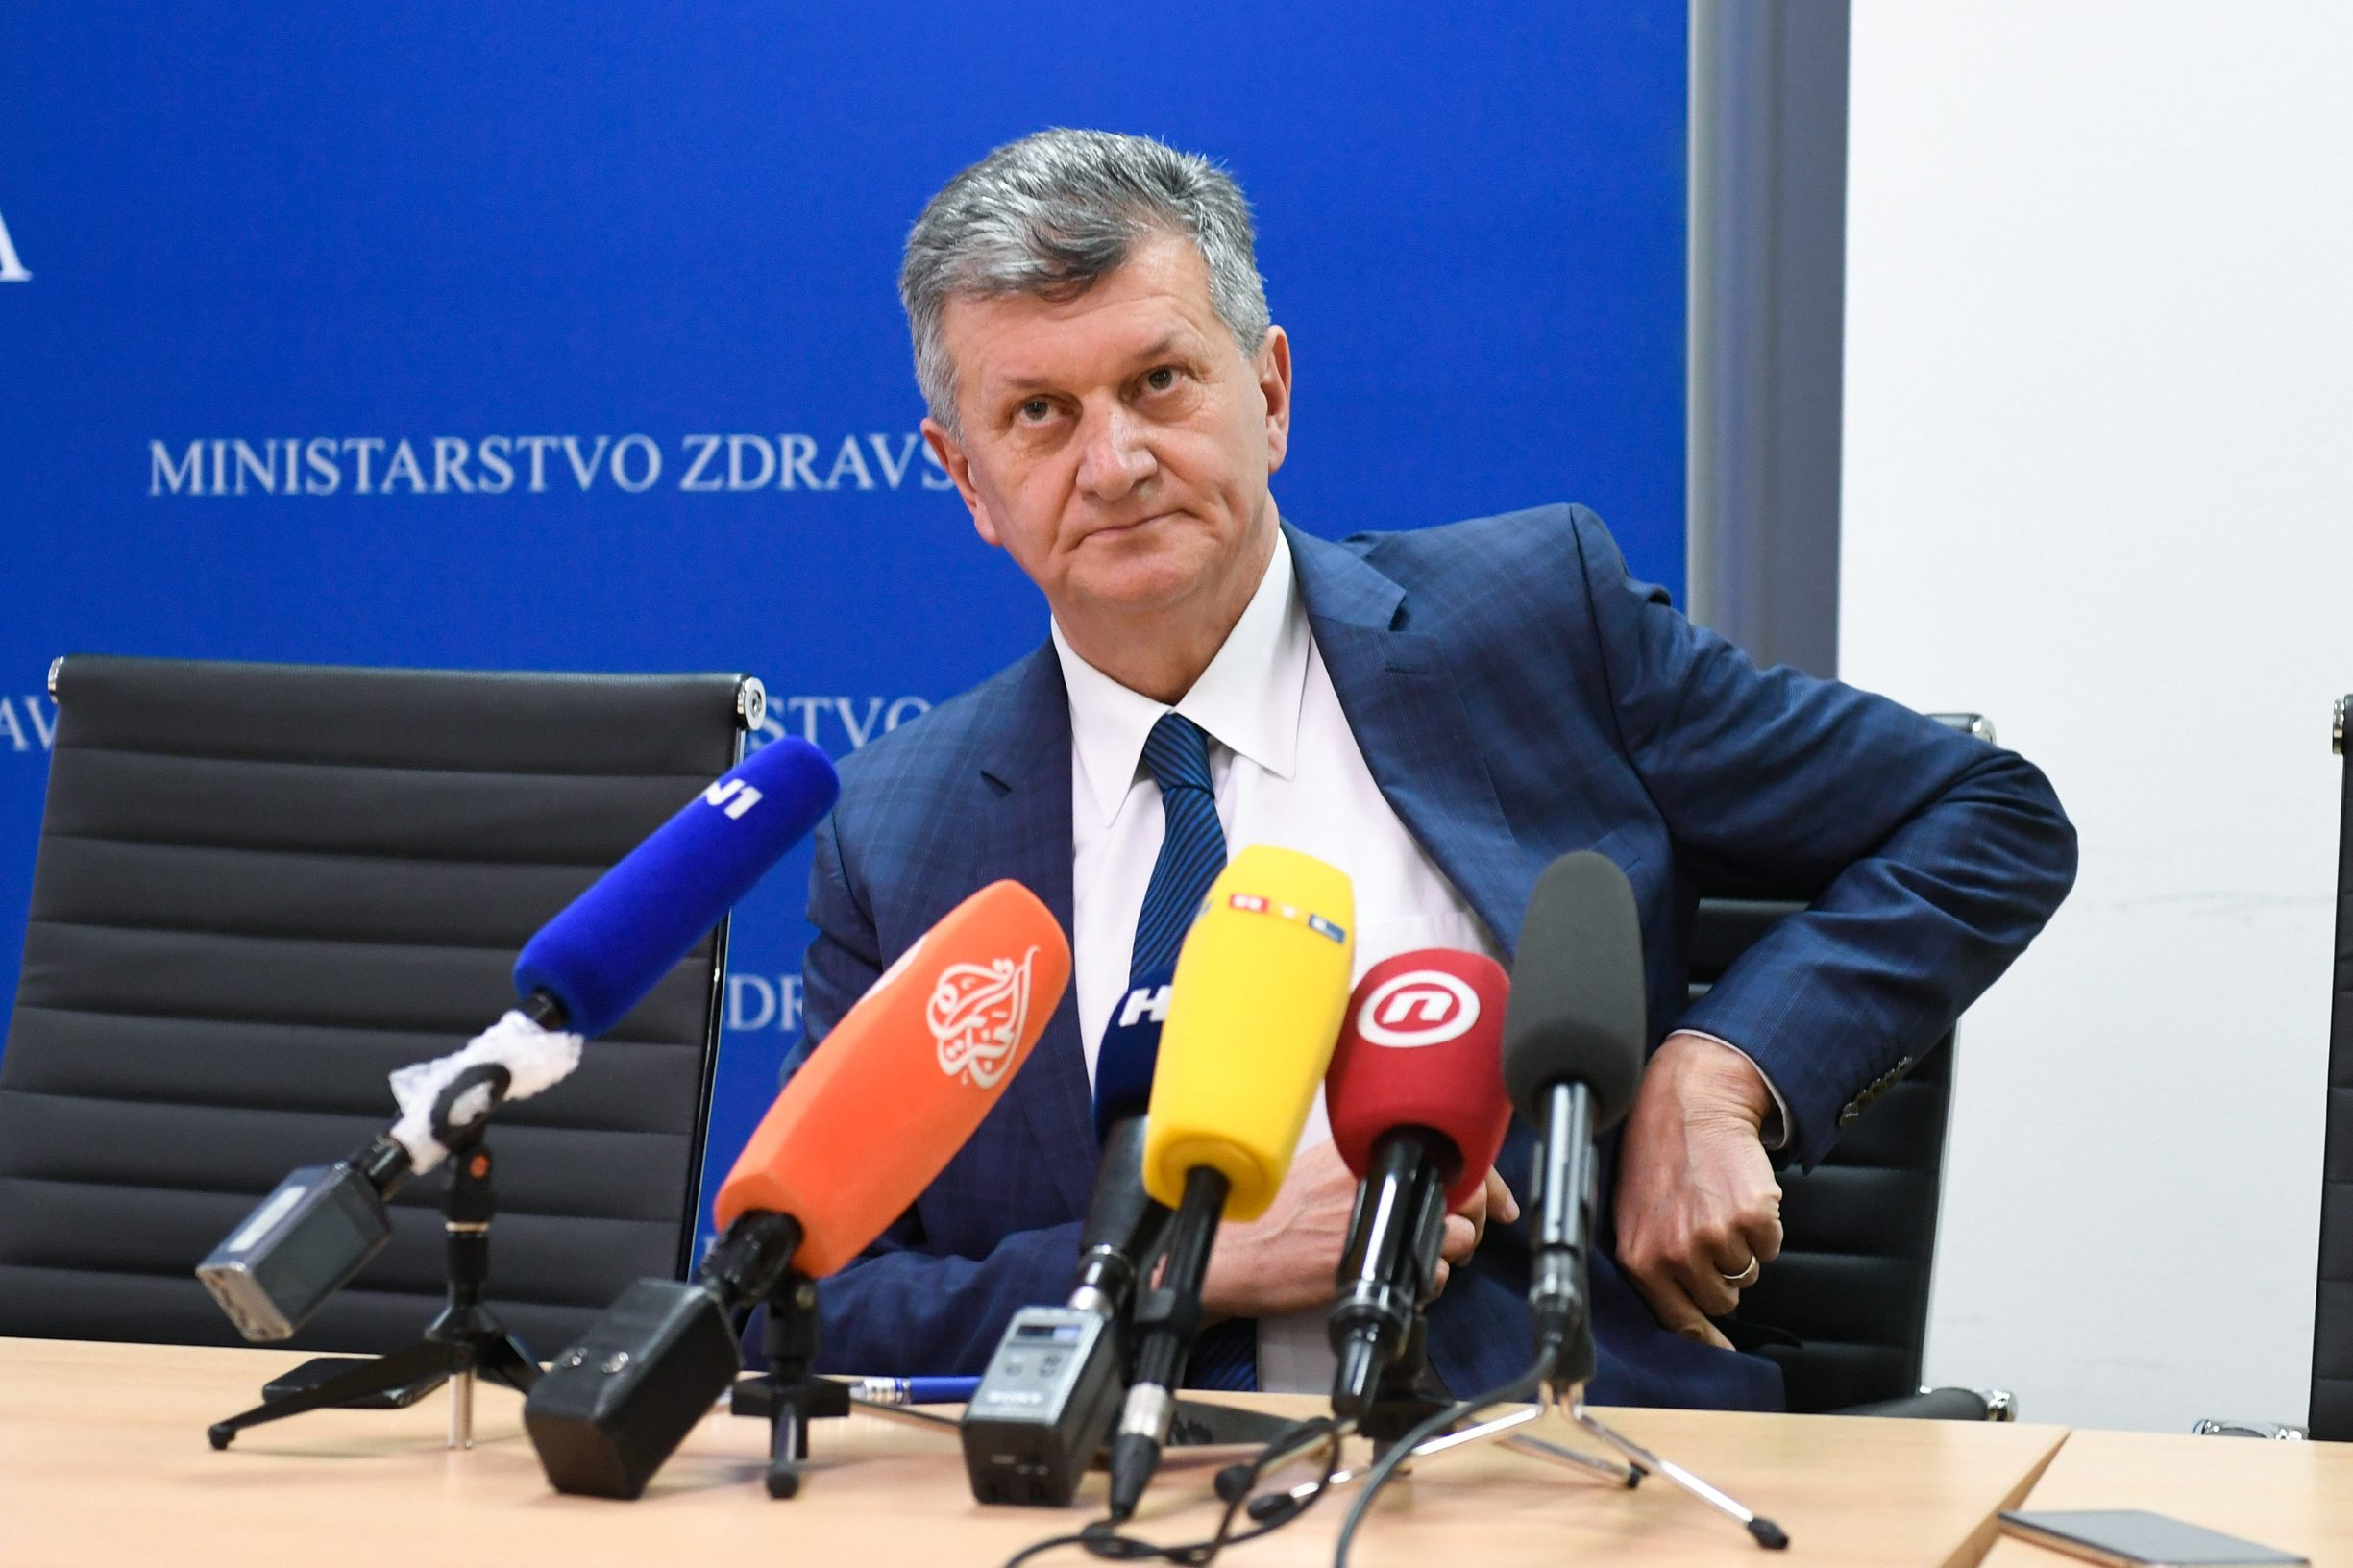 Zagreb, 240120. Ministarstvo zdravlja. Press konferencija Milana Kujundzica , ministra zdravlja. Foto: Goran Mehkek / CROPIX